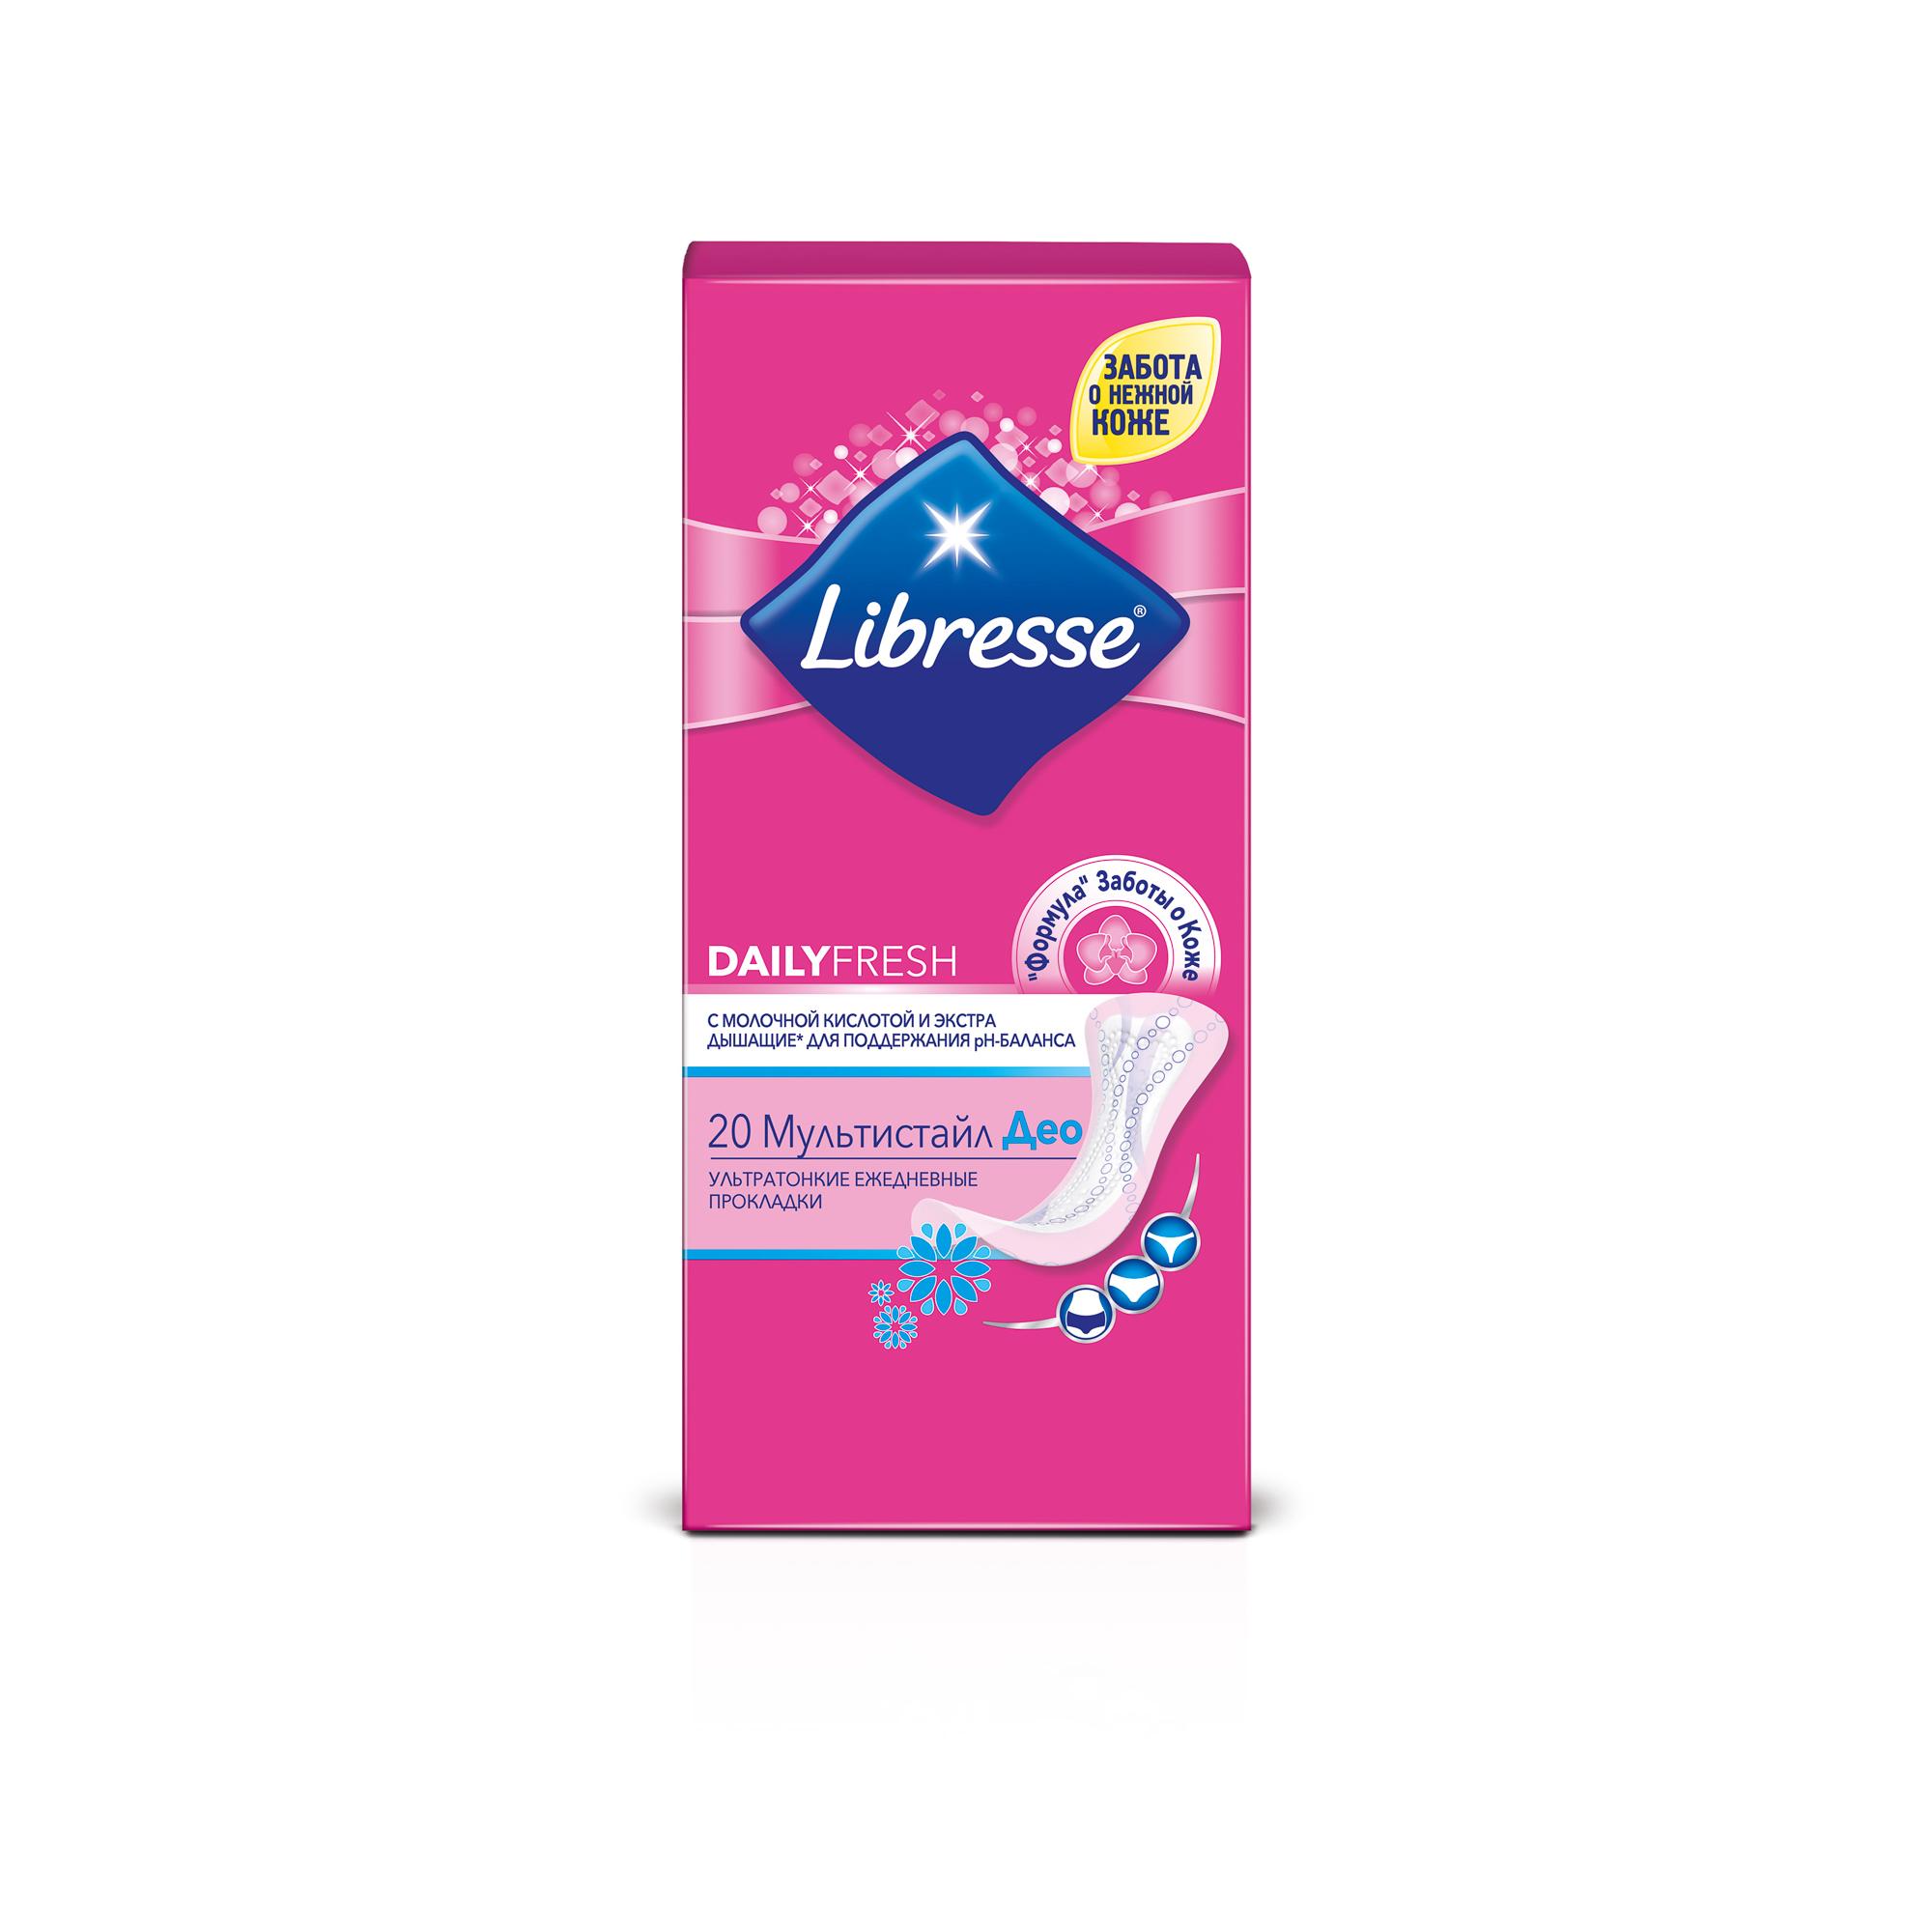 Ежедневные прокладки Libresse Dailyfresh Multistyle Deo, 20 шт. прокладки libresse dailyfresh нормал део 32шт ежедн